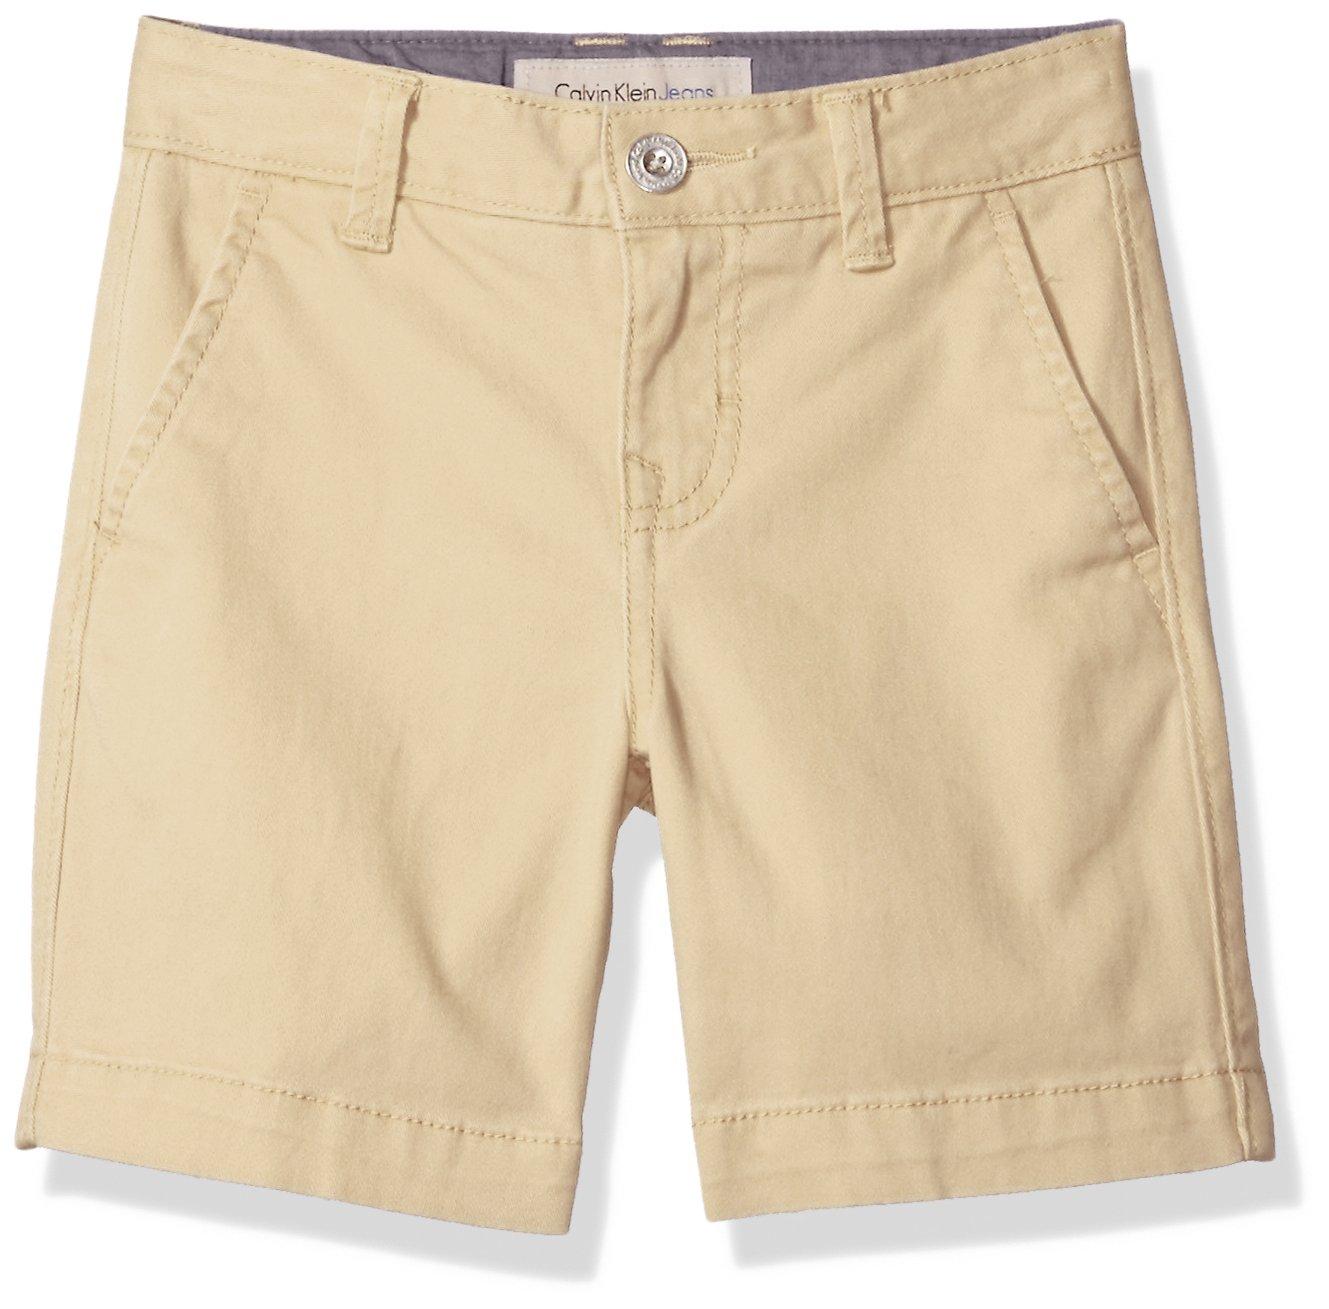 Calvin Klein Big Boys' Motion Stretch Flat Front Short, Tan, 14